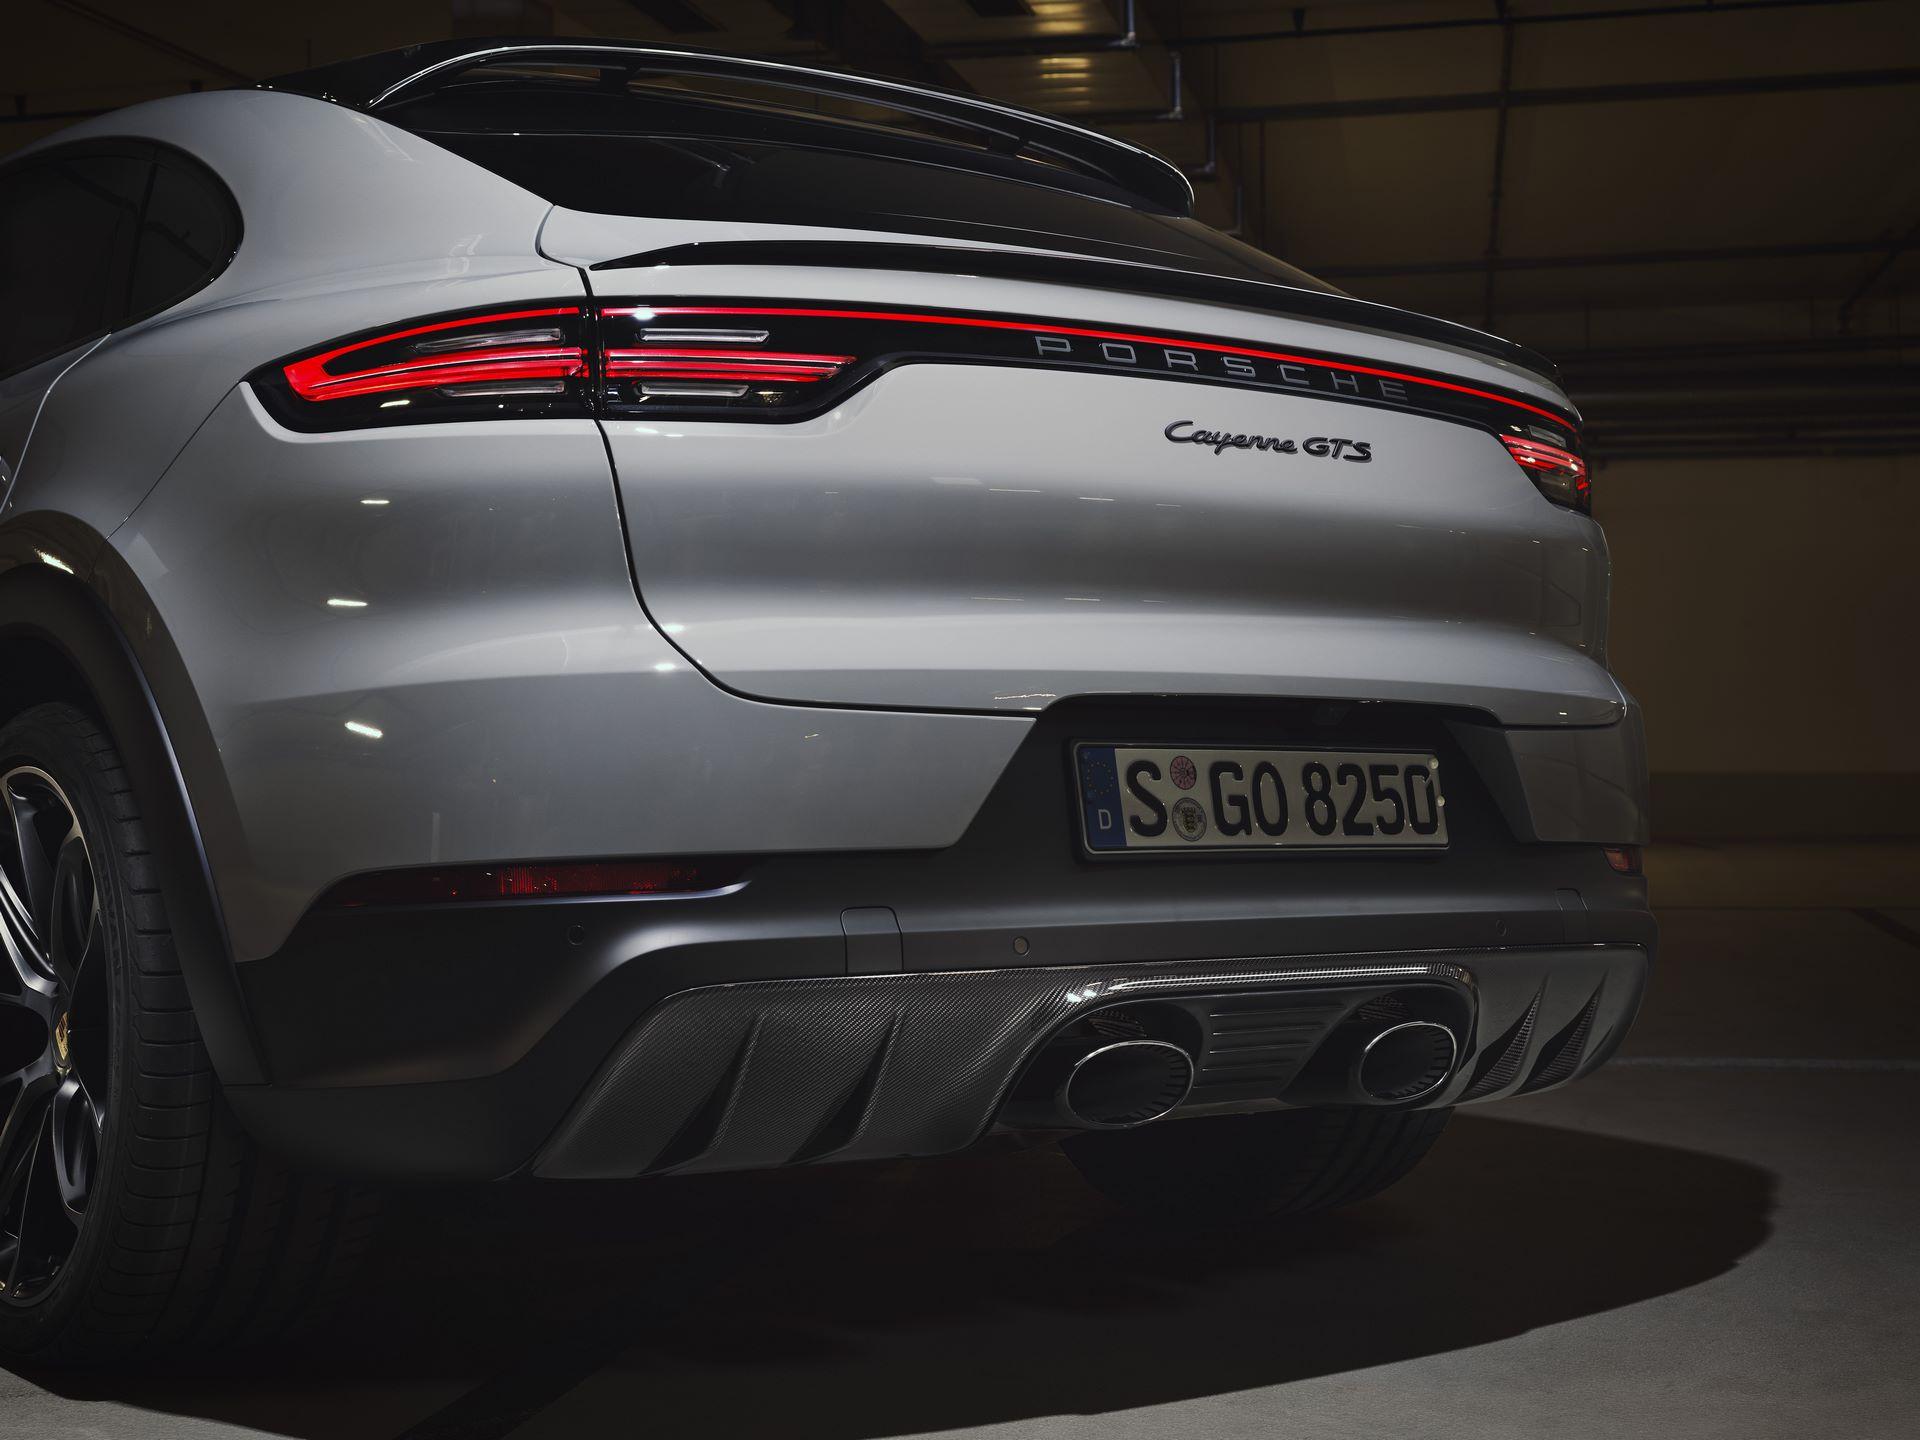 Porsche-Cayenne-GTS-and-Cayenne-GTS-Coupe-2021-6